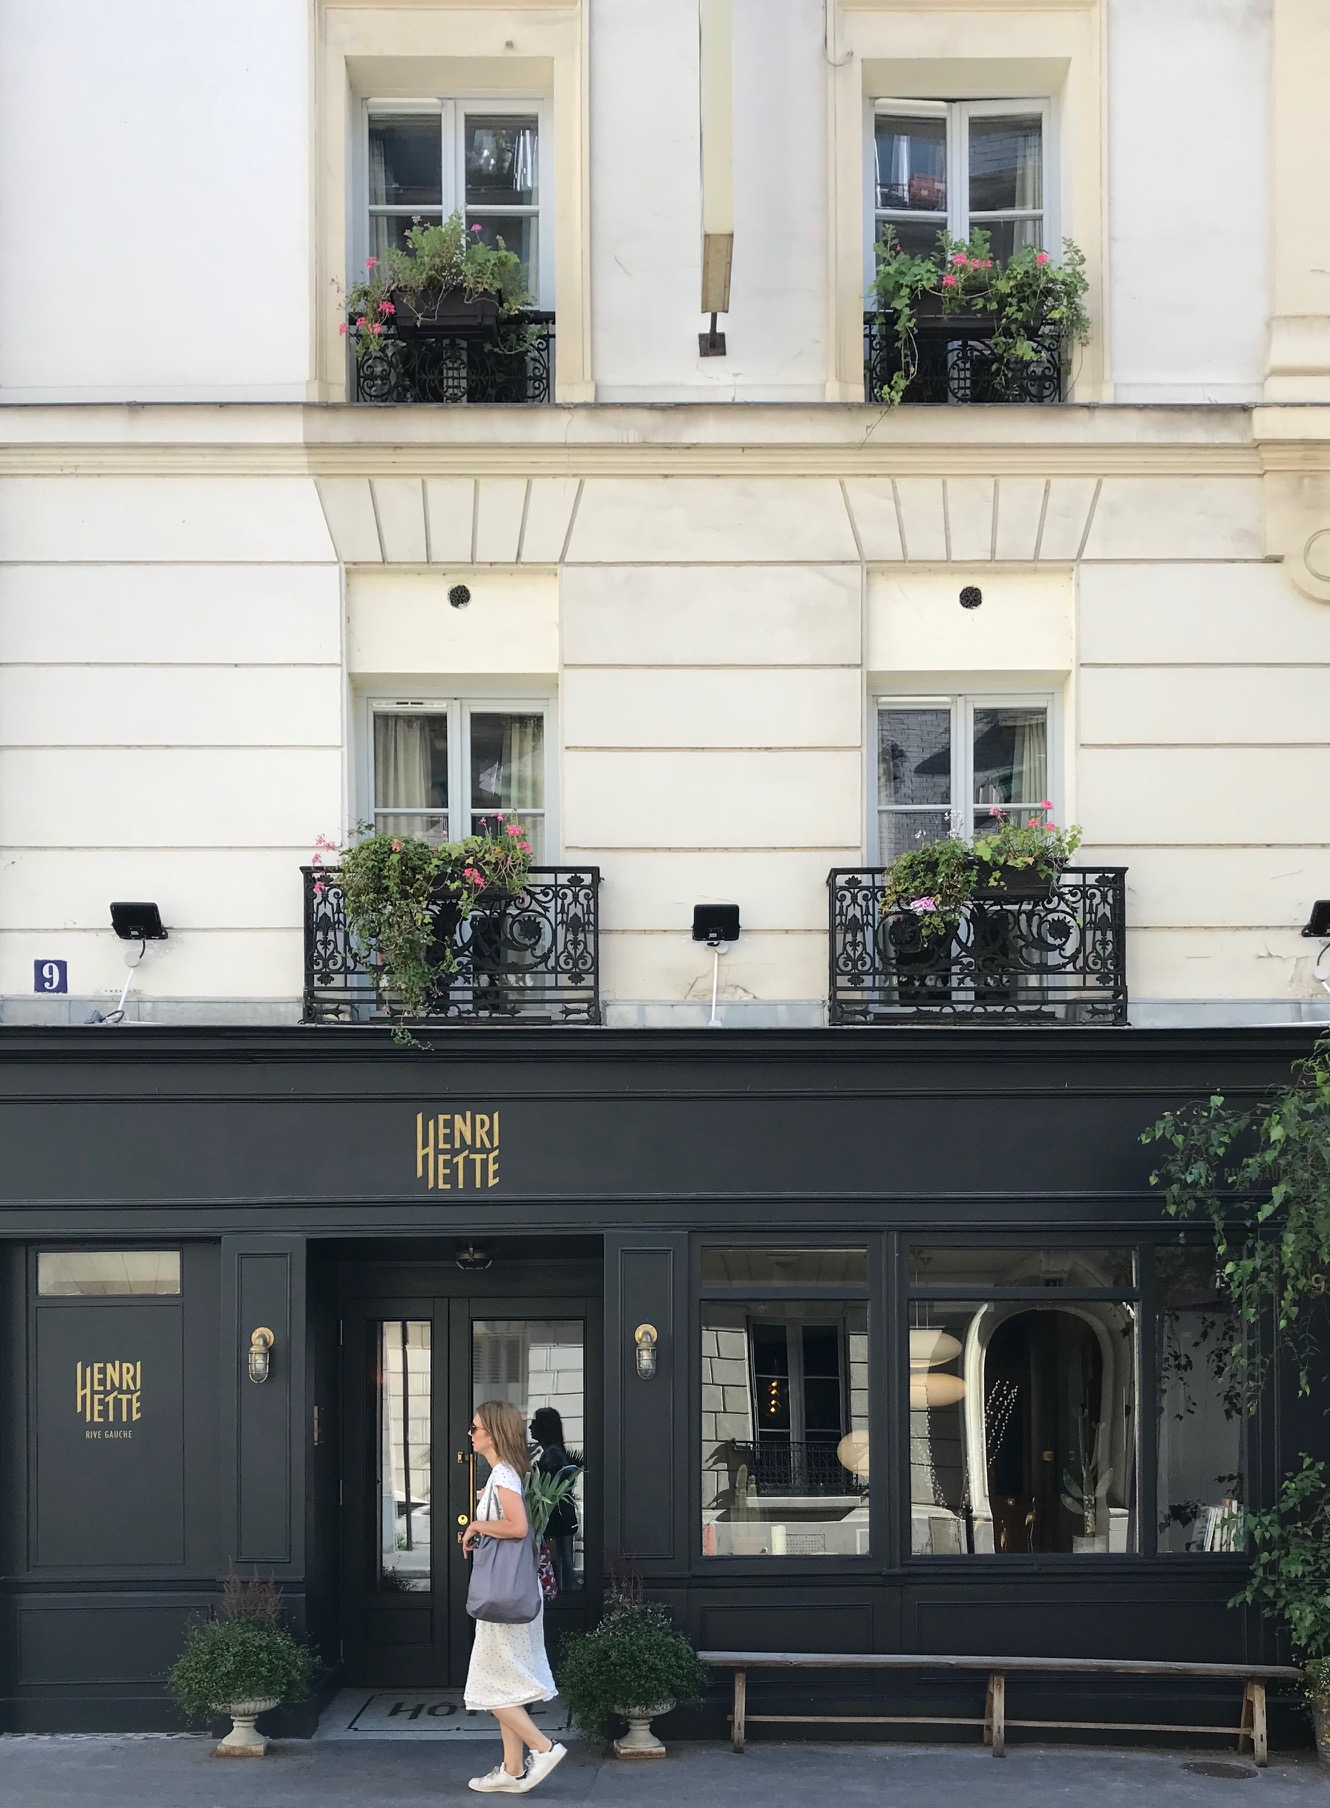 Hotel Henriette Parijs